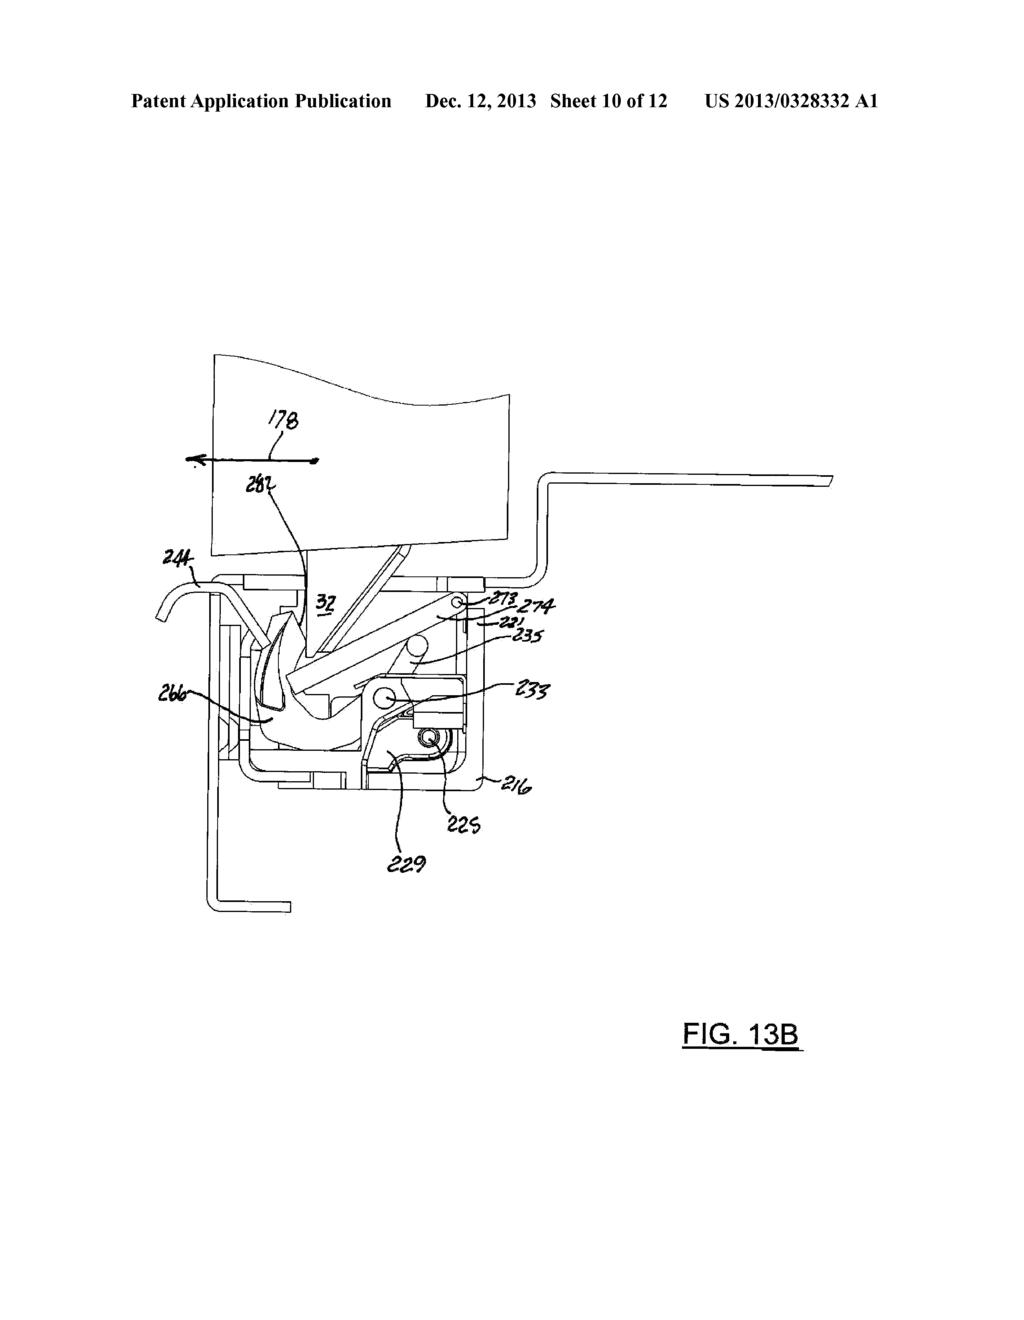 electric door strike having a dead latch release platform actuated rh patentsencyclopedia com deadlatch parts diagram deadlatch parts diagram